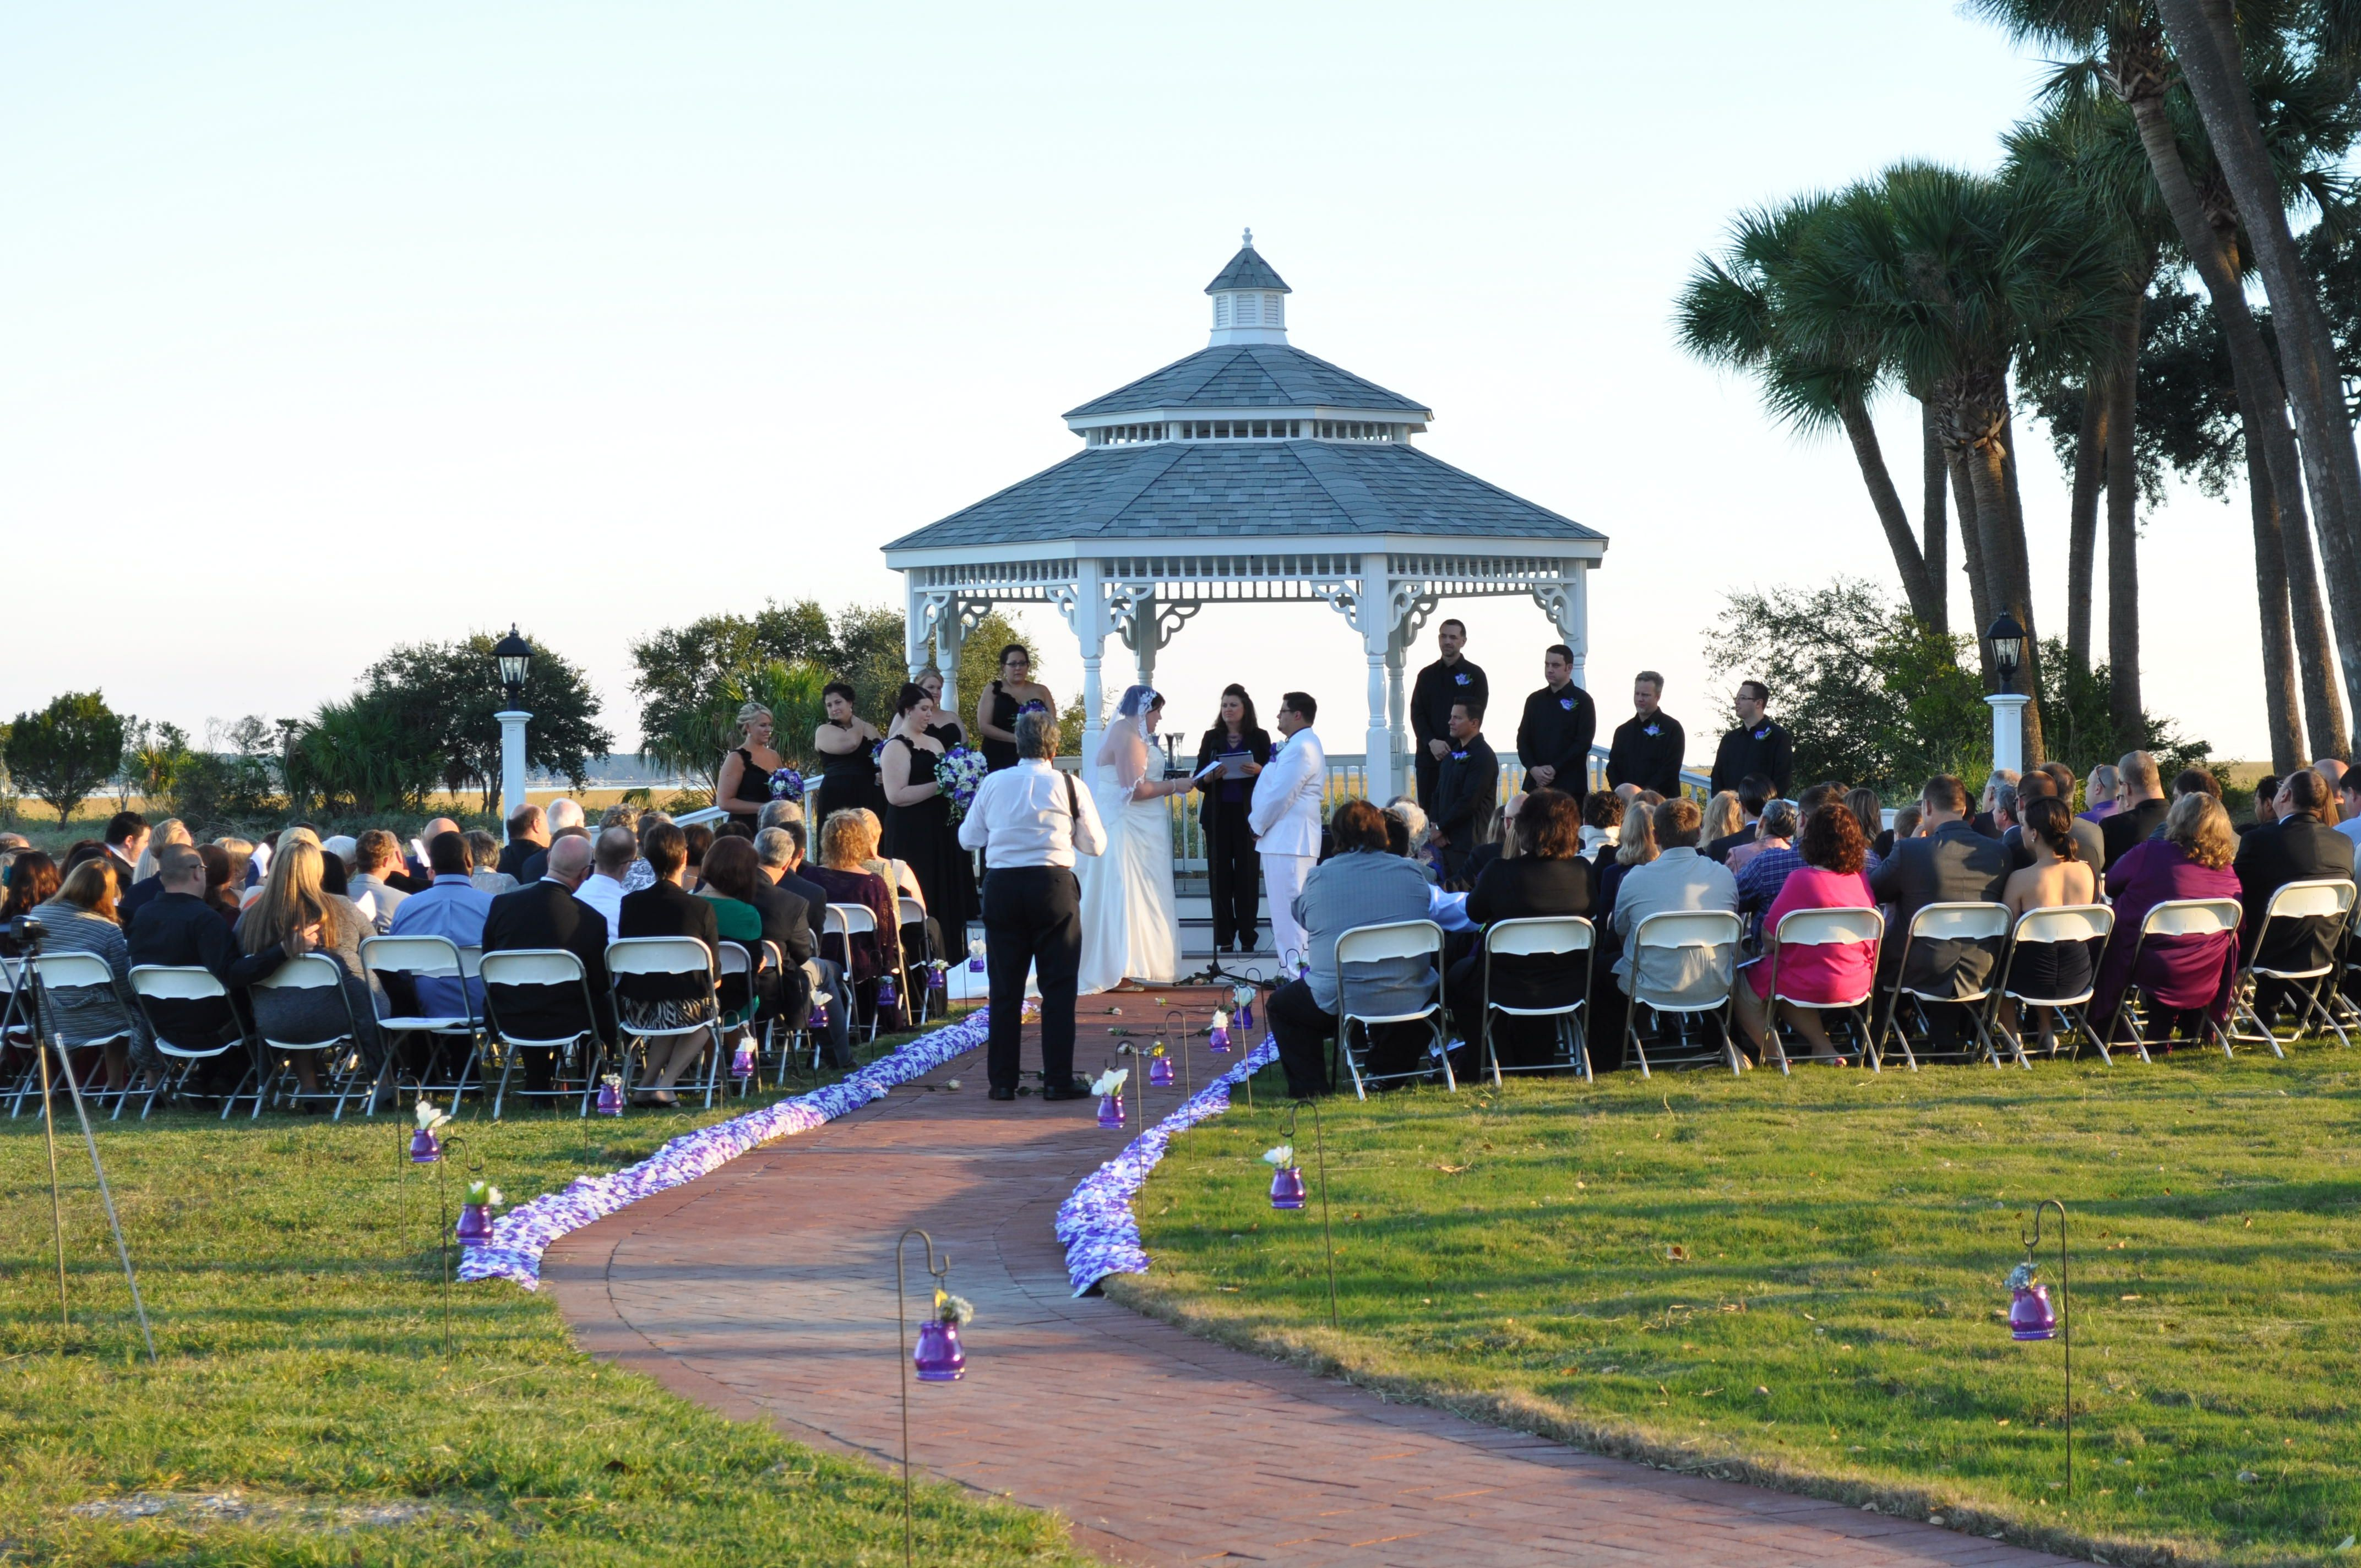 Beaufort Weddings - Gazebo Wedding ceremony at Traditions on